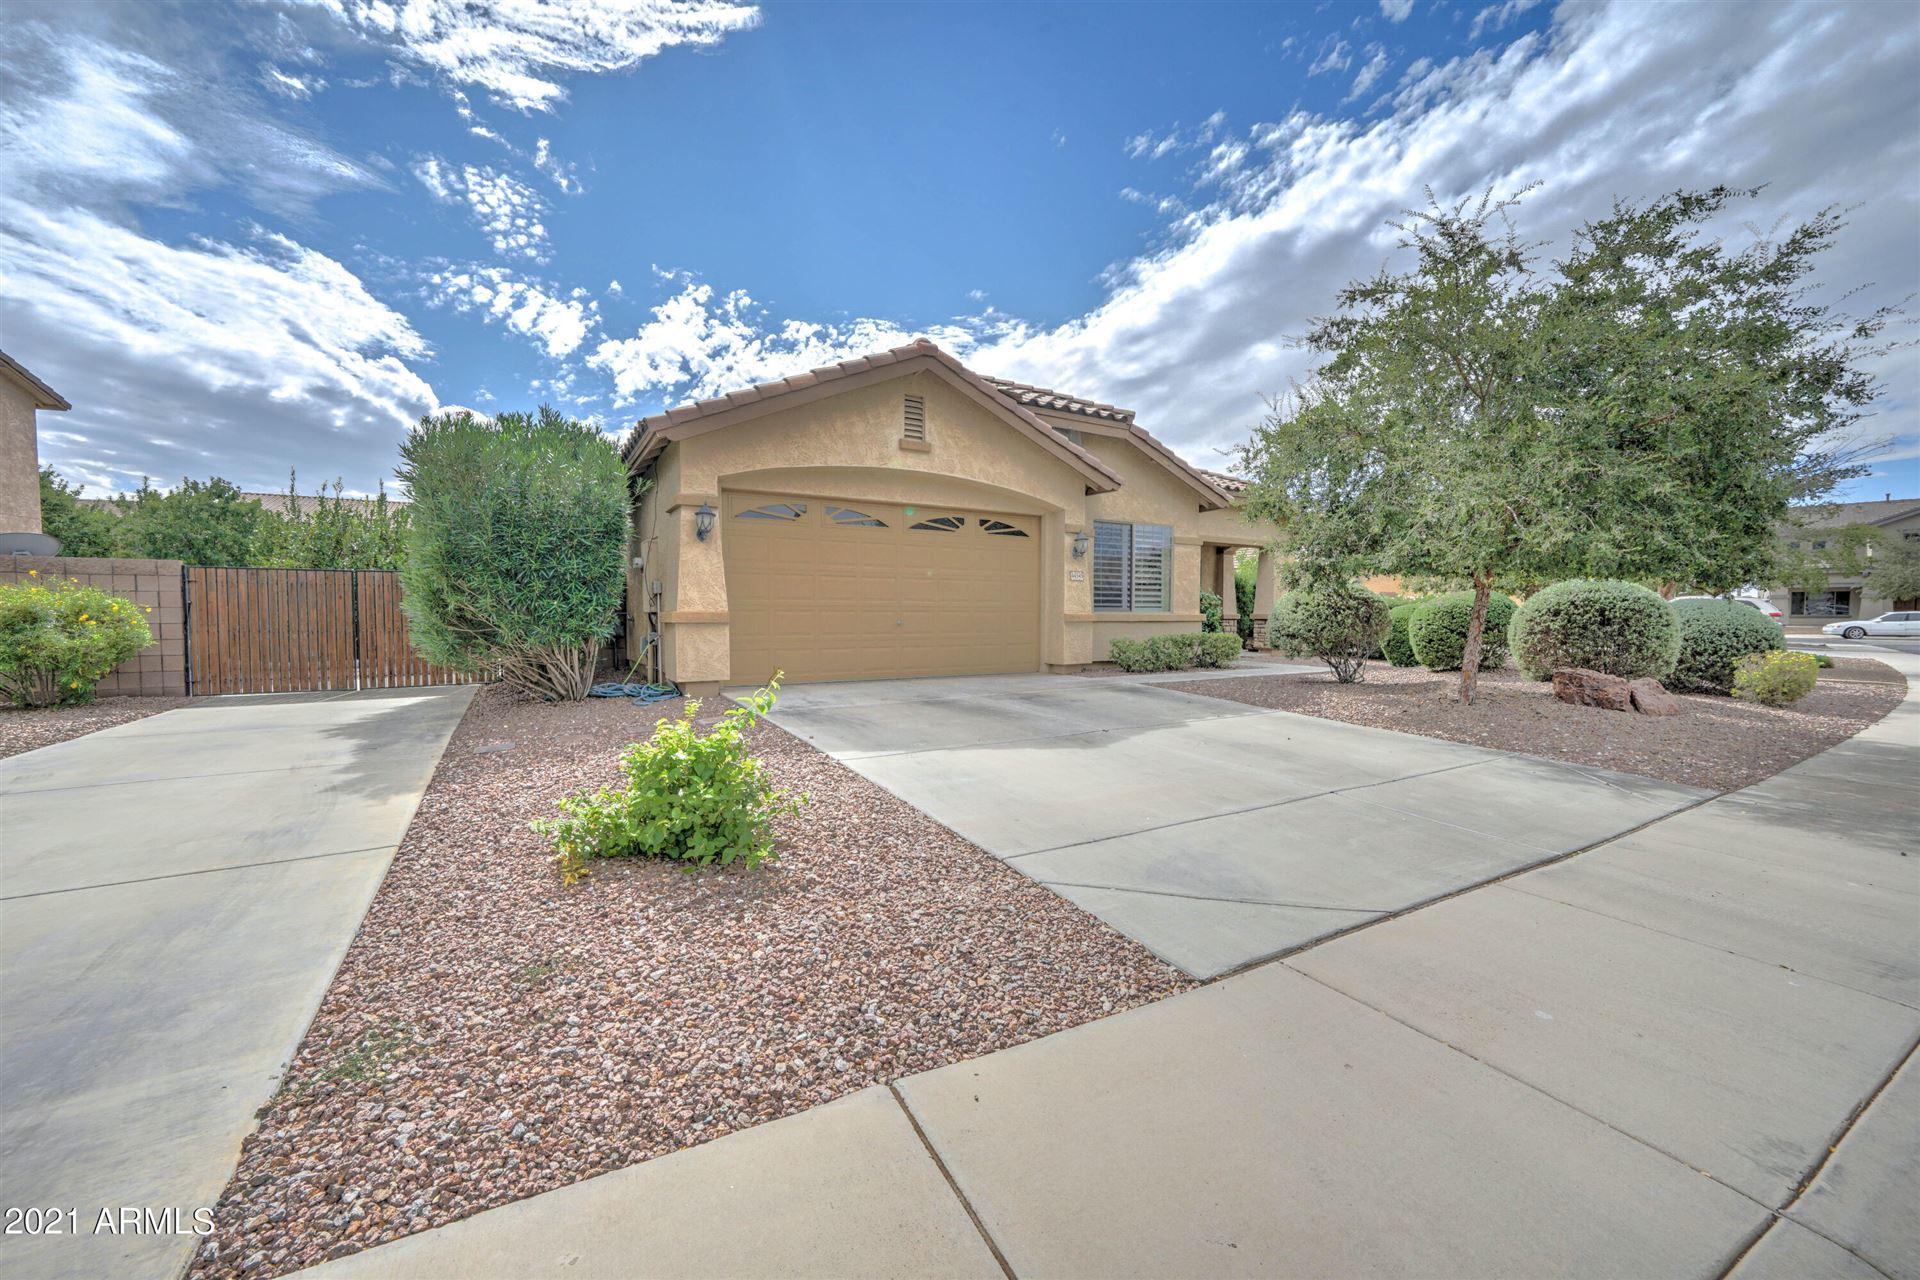 44545 W VINEYARD Street, Maricopa, AZ 85139 - #: 6304393